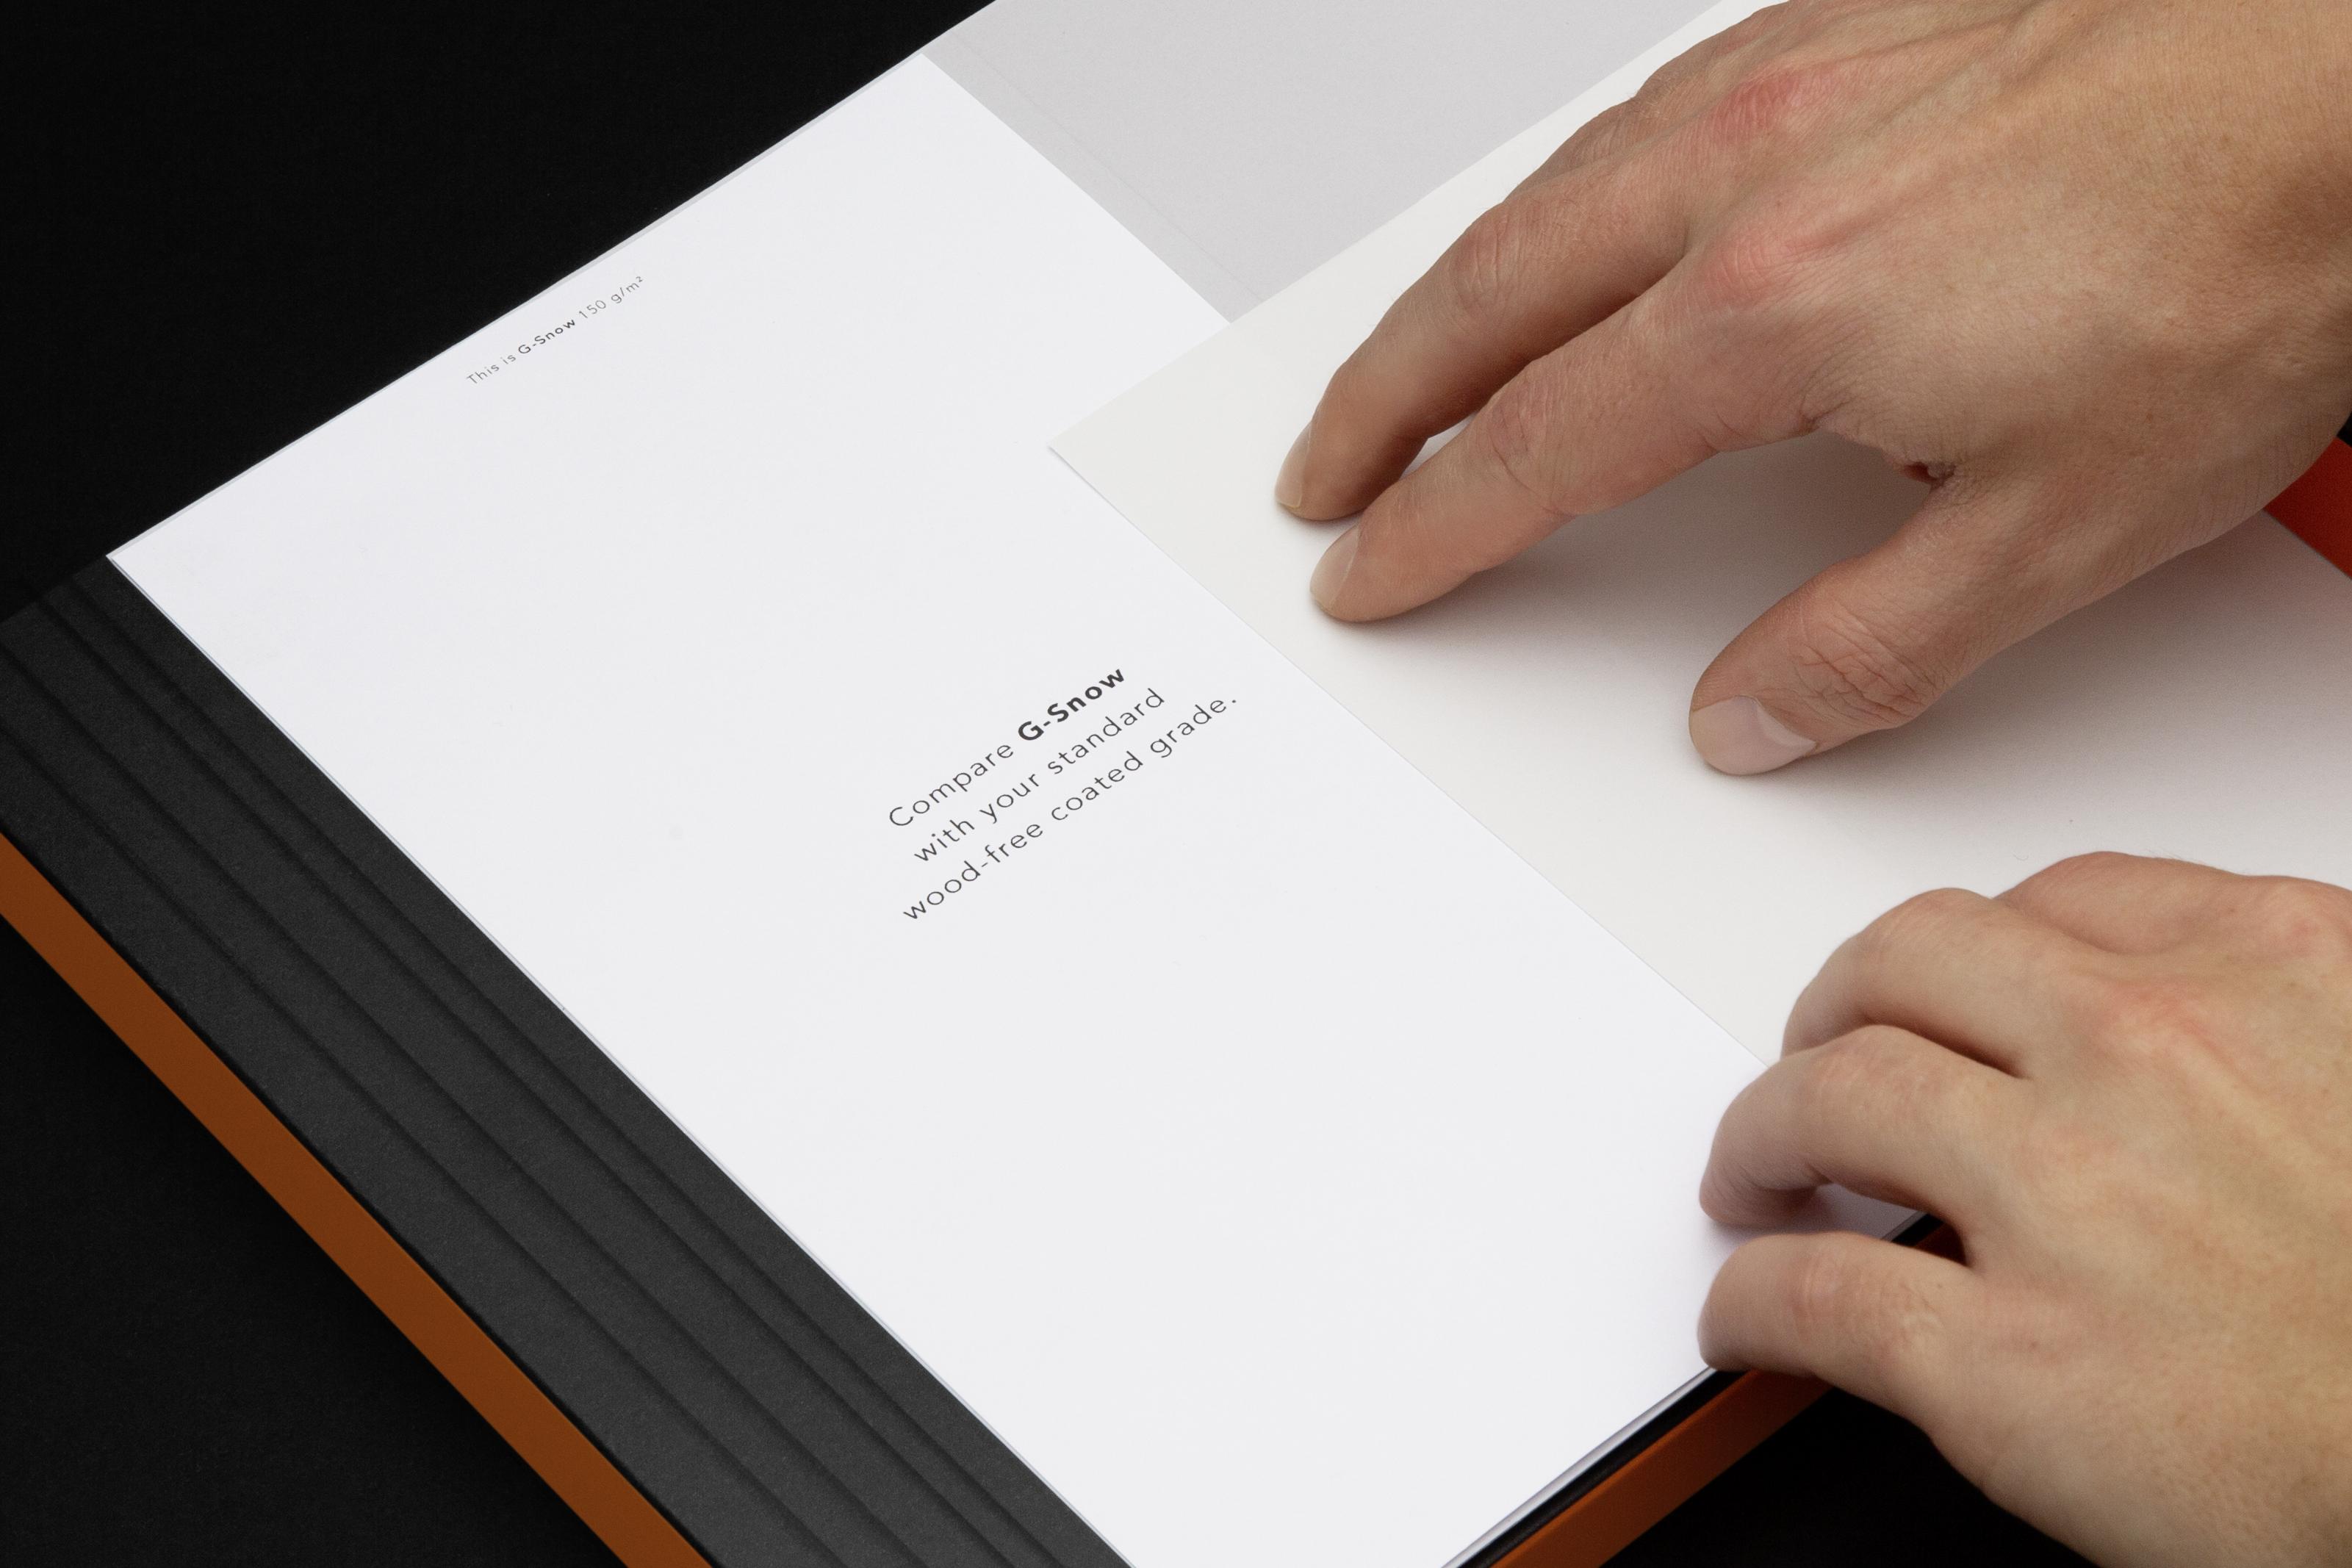 Nykomna Arctic Paper lanserar ett ultravitt papper | PAPPERochMASSA.se PV-79